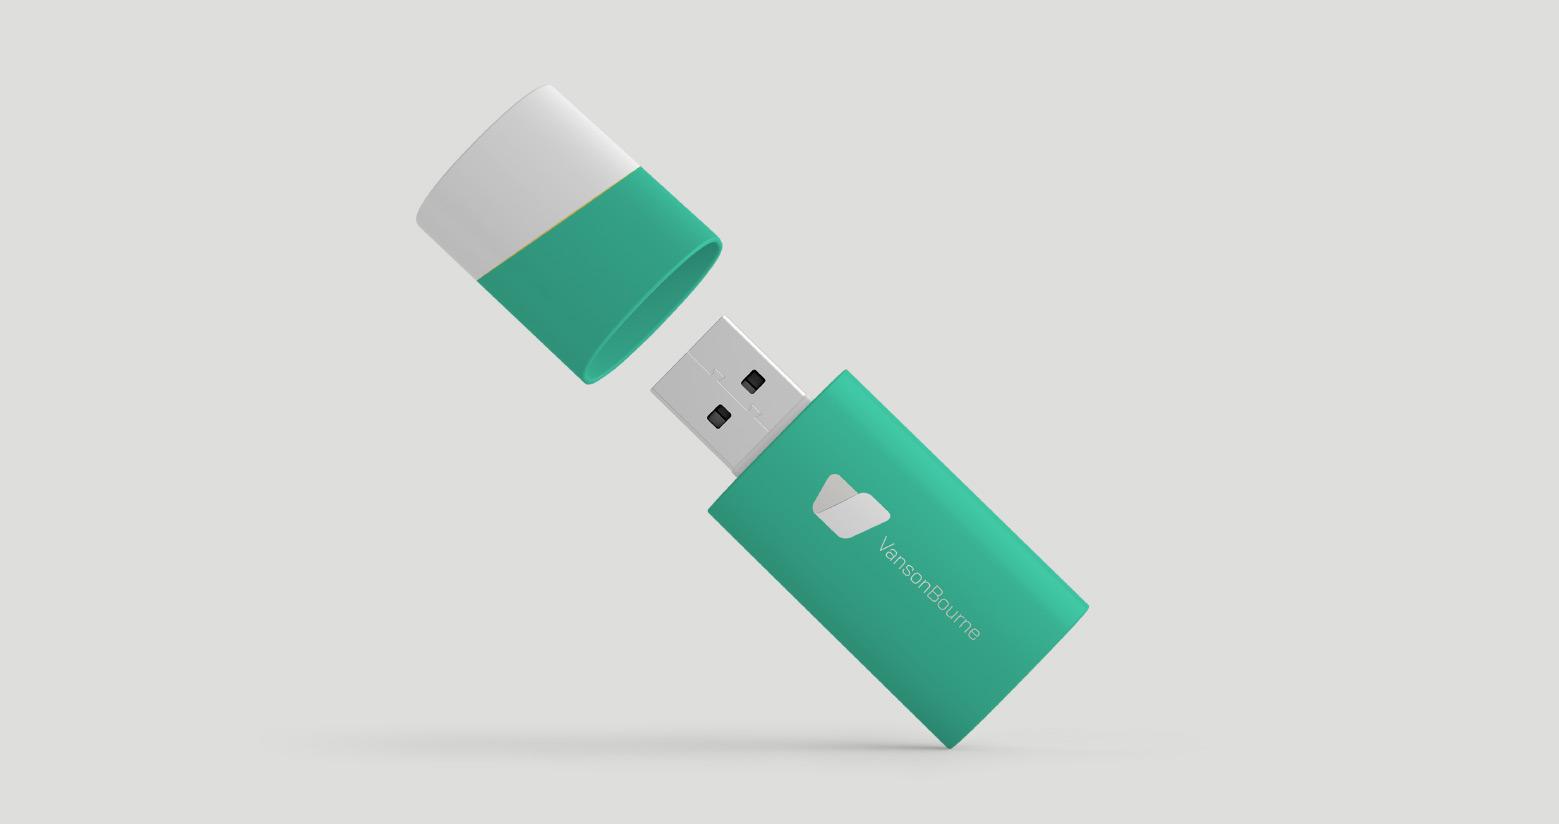 Vanson Bourne USB Stick Design